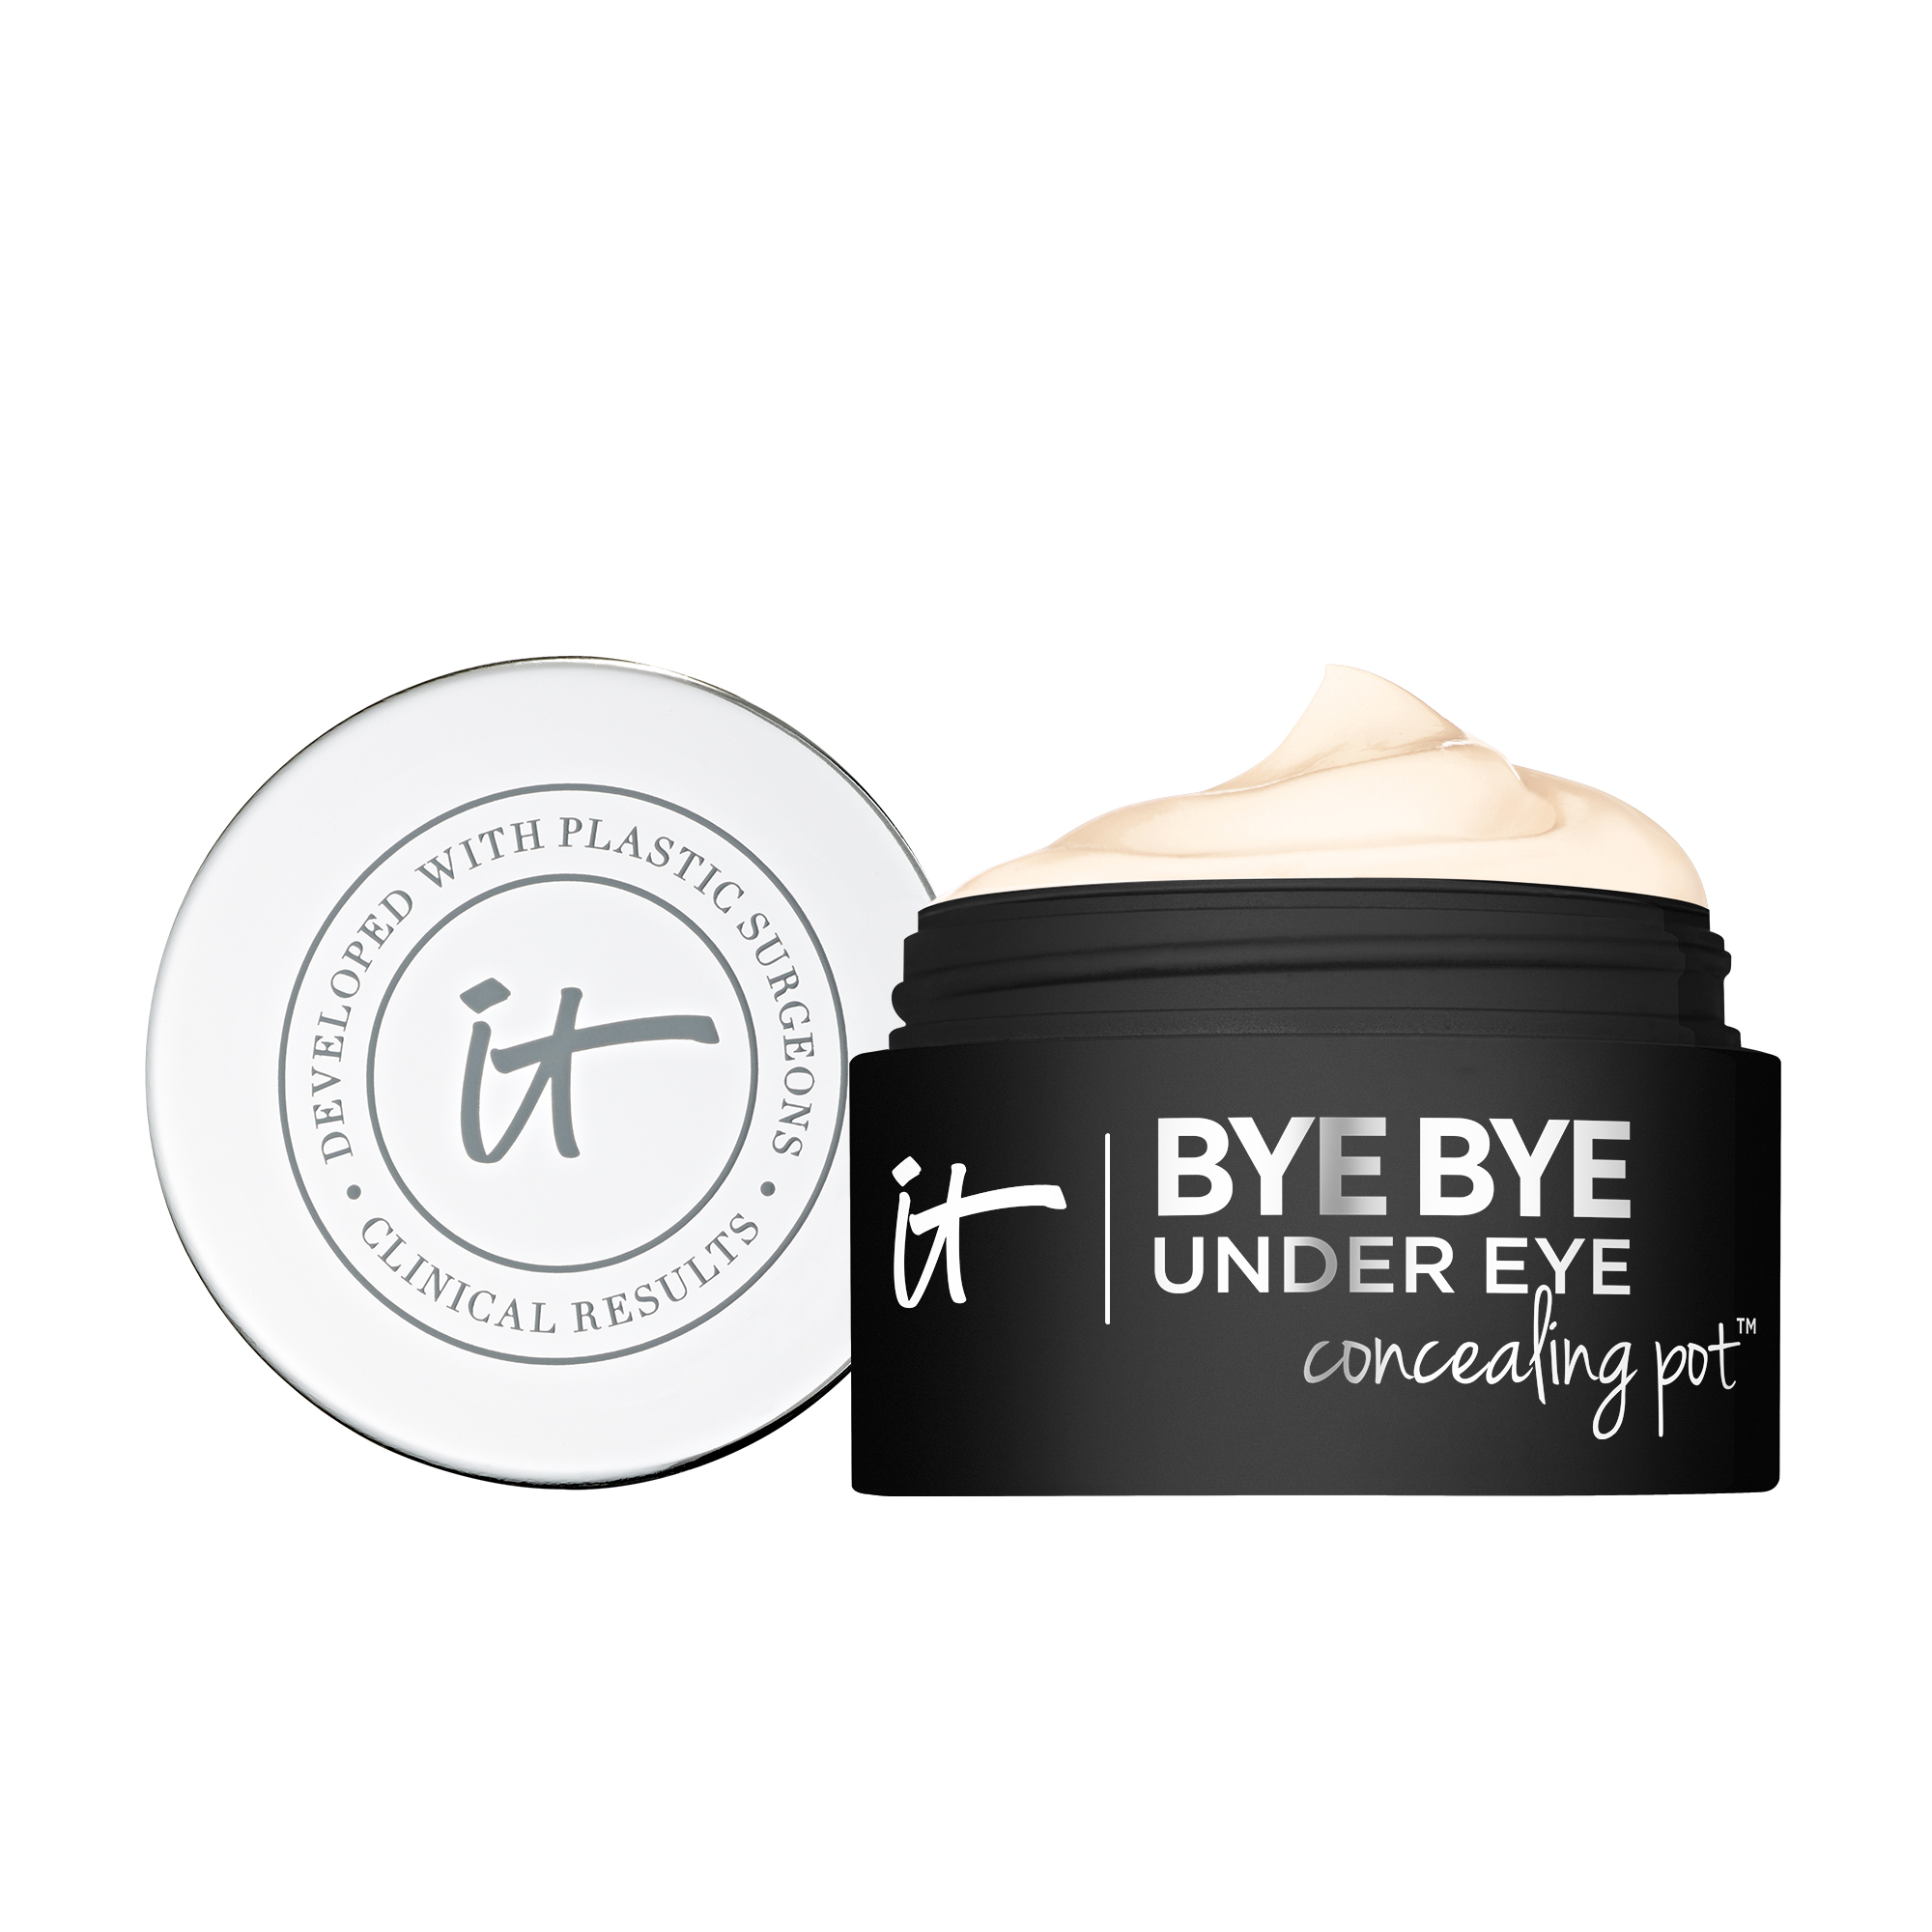 Bye Bye Under Eye™ Concealing Pot Light